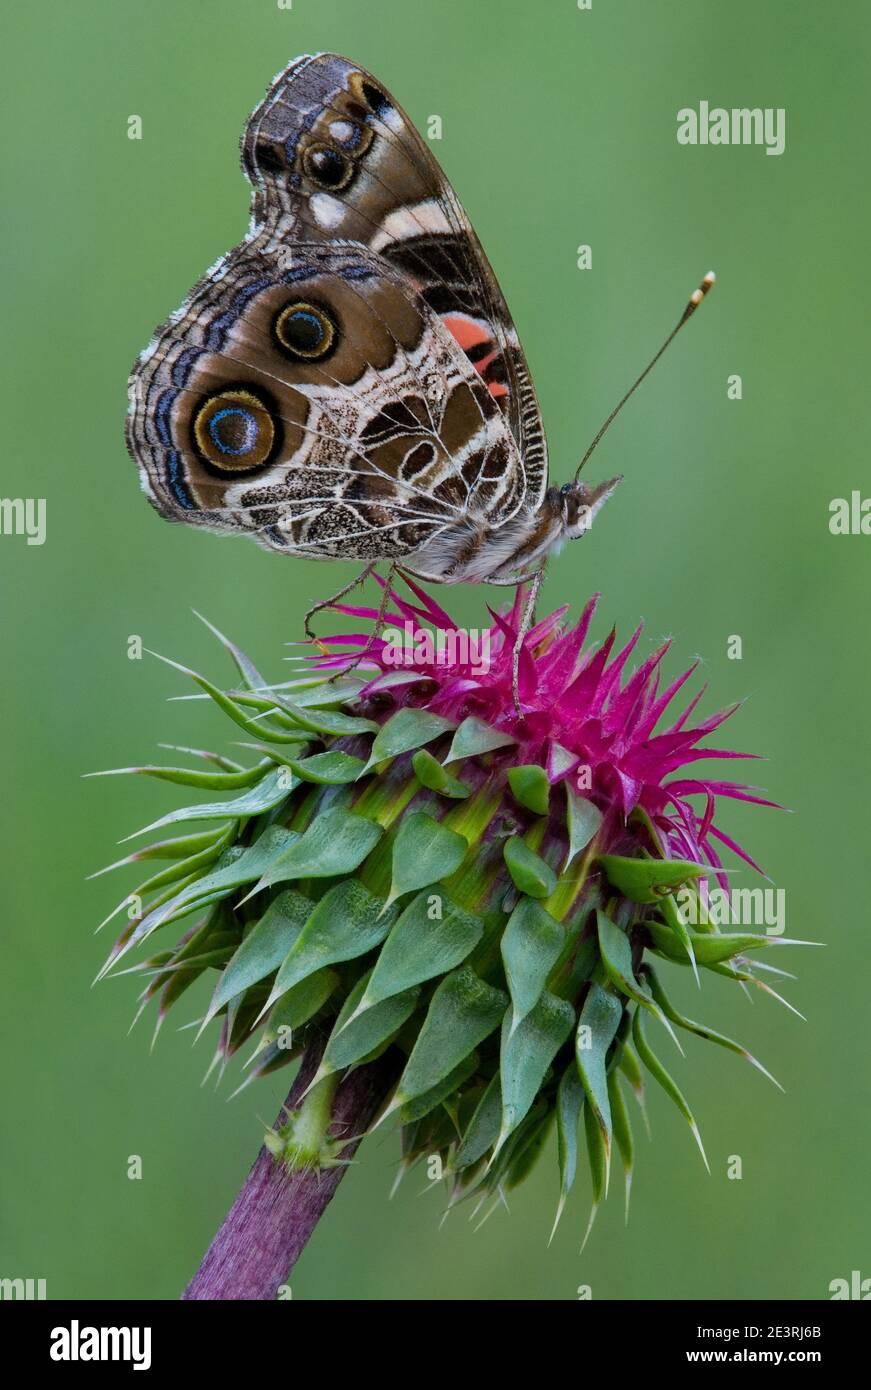 American Painted Lady Butterfly (Vanessa cardui) alimentándose de la flor de la nodding Thistle (Carduus nutans), EE.UU., por Skip Moody/Dembinsky Photo Assoc Foto de stock